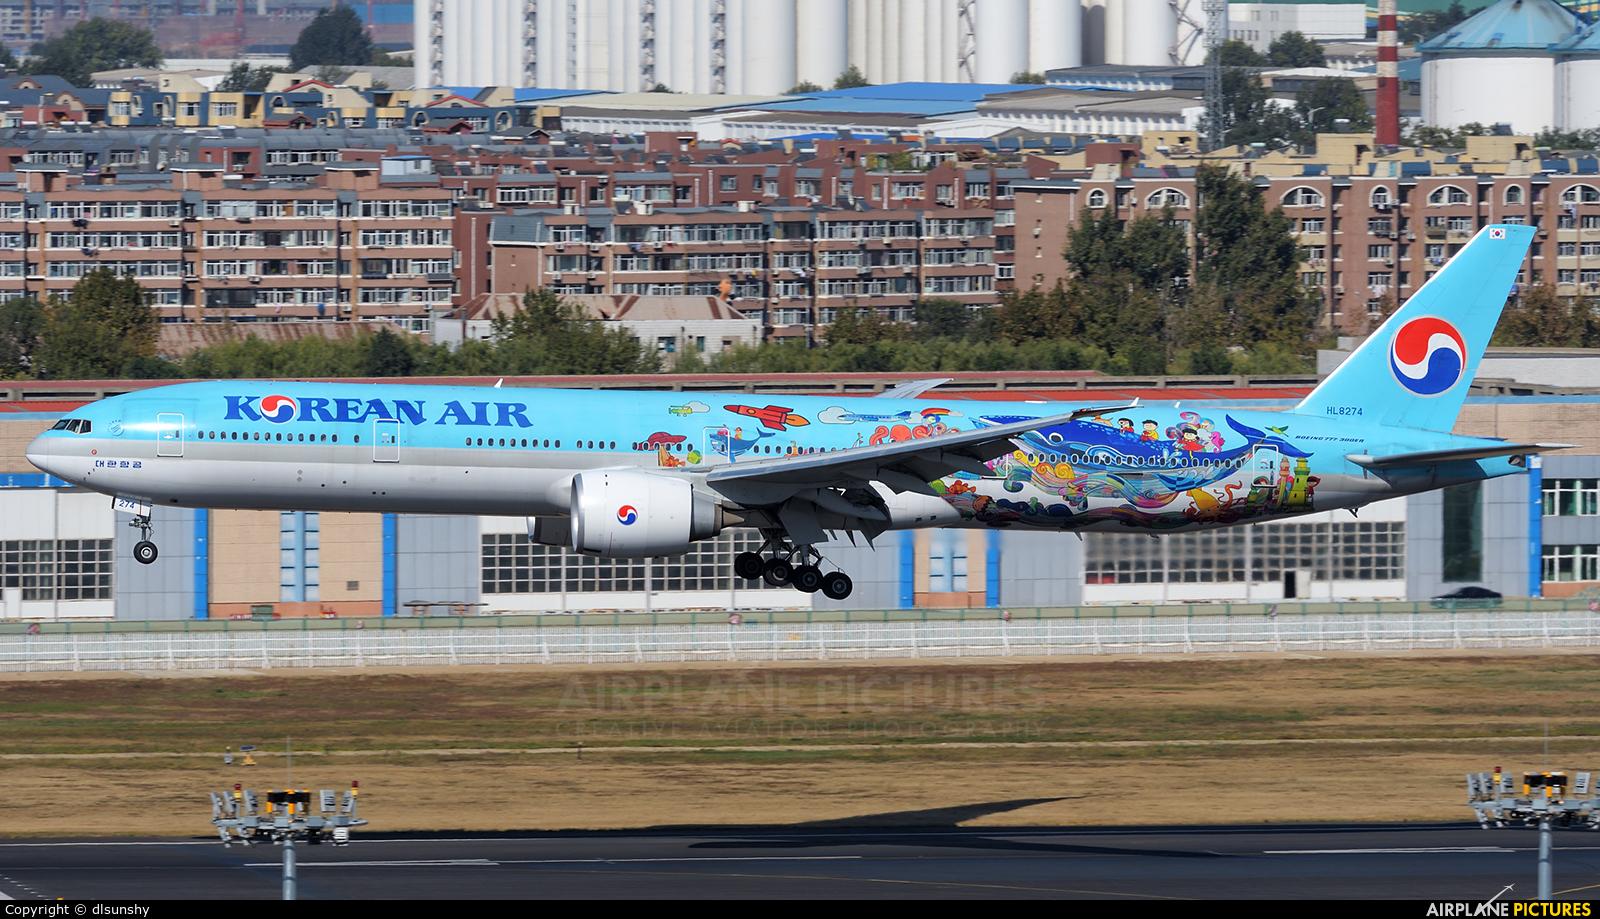 Korean Air HL8274 aircraft at Dalian Zhoushuizi Int'l